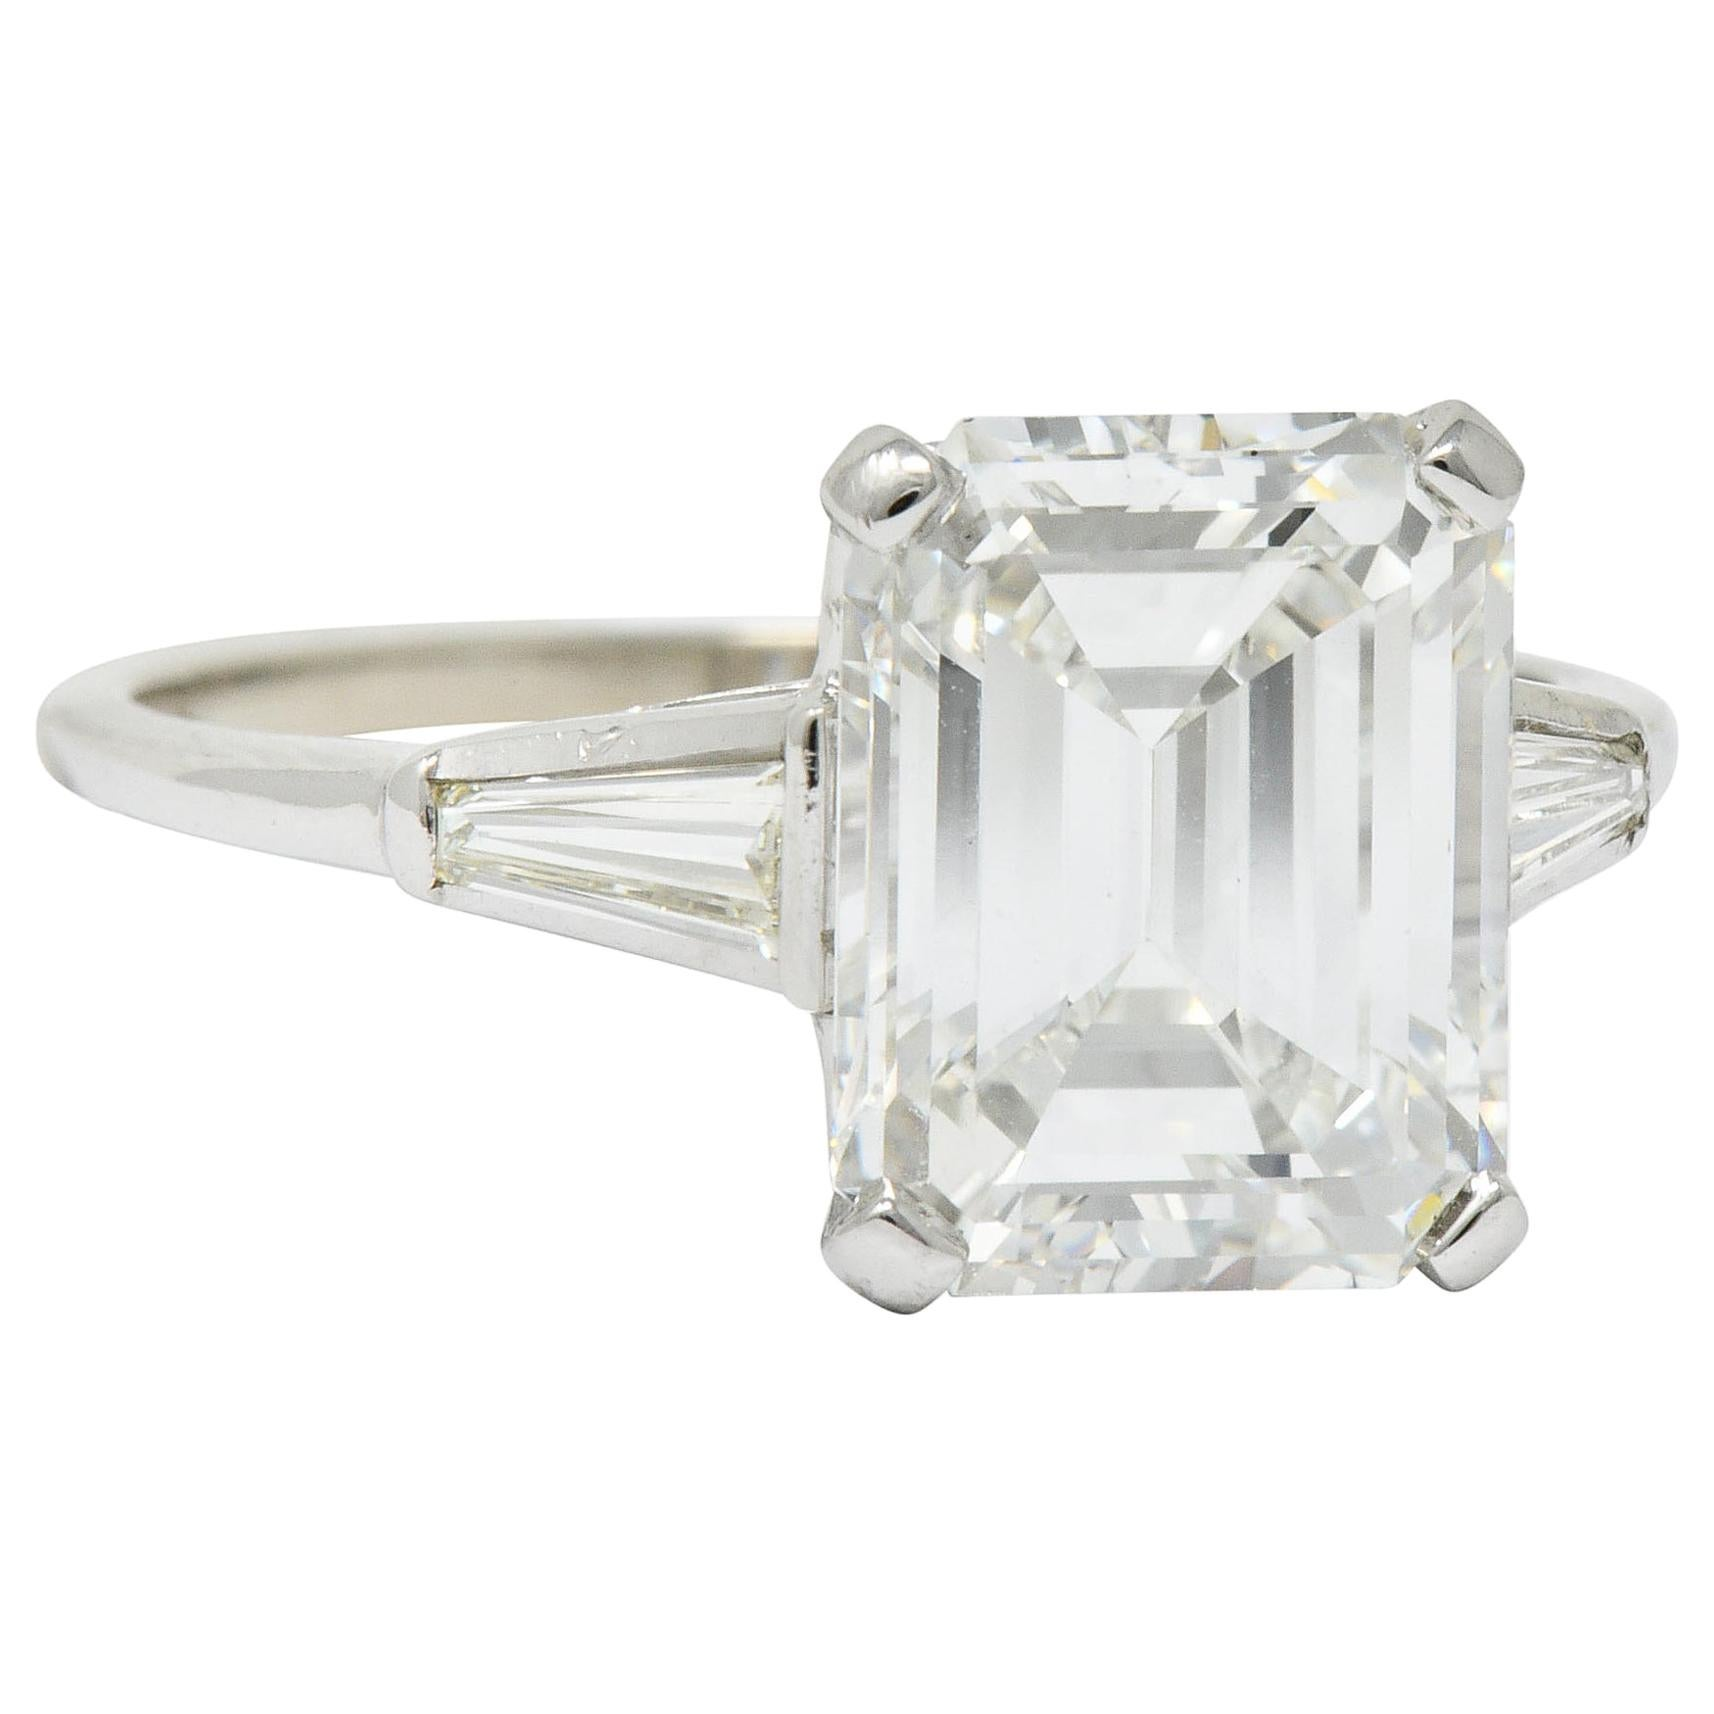 Substantial 4.58 Carat Emerald Cut Diamond Platinum Engagement Ring GIA